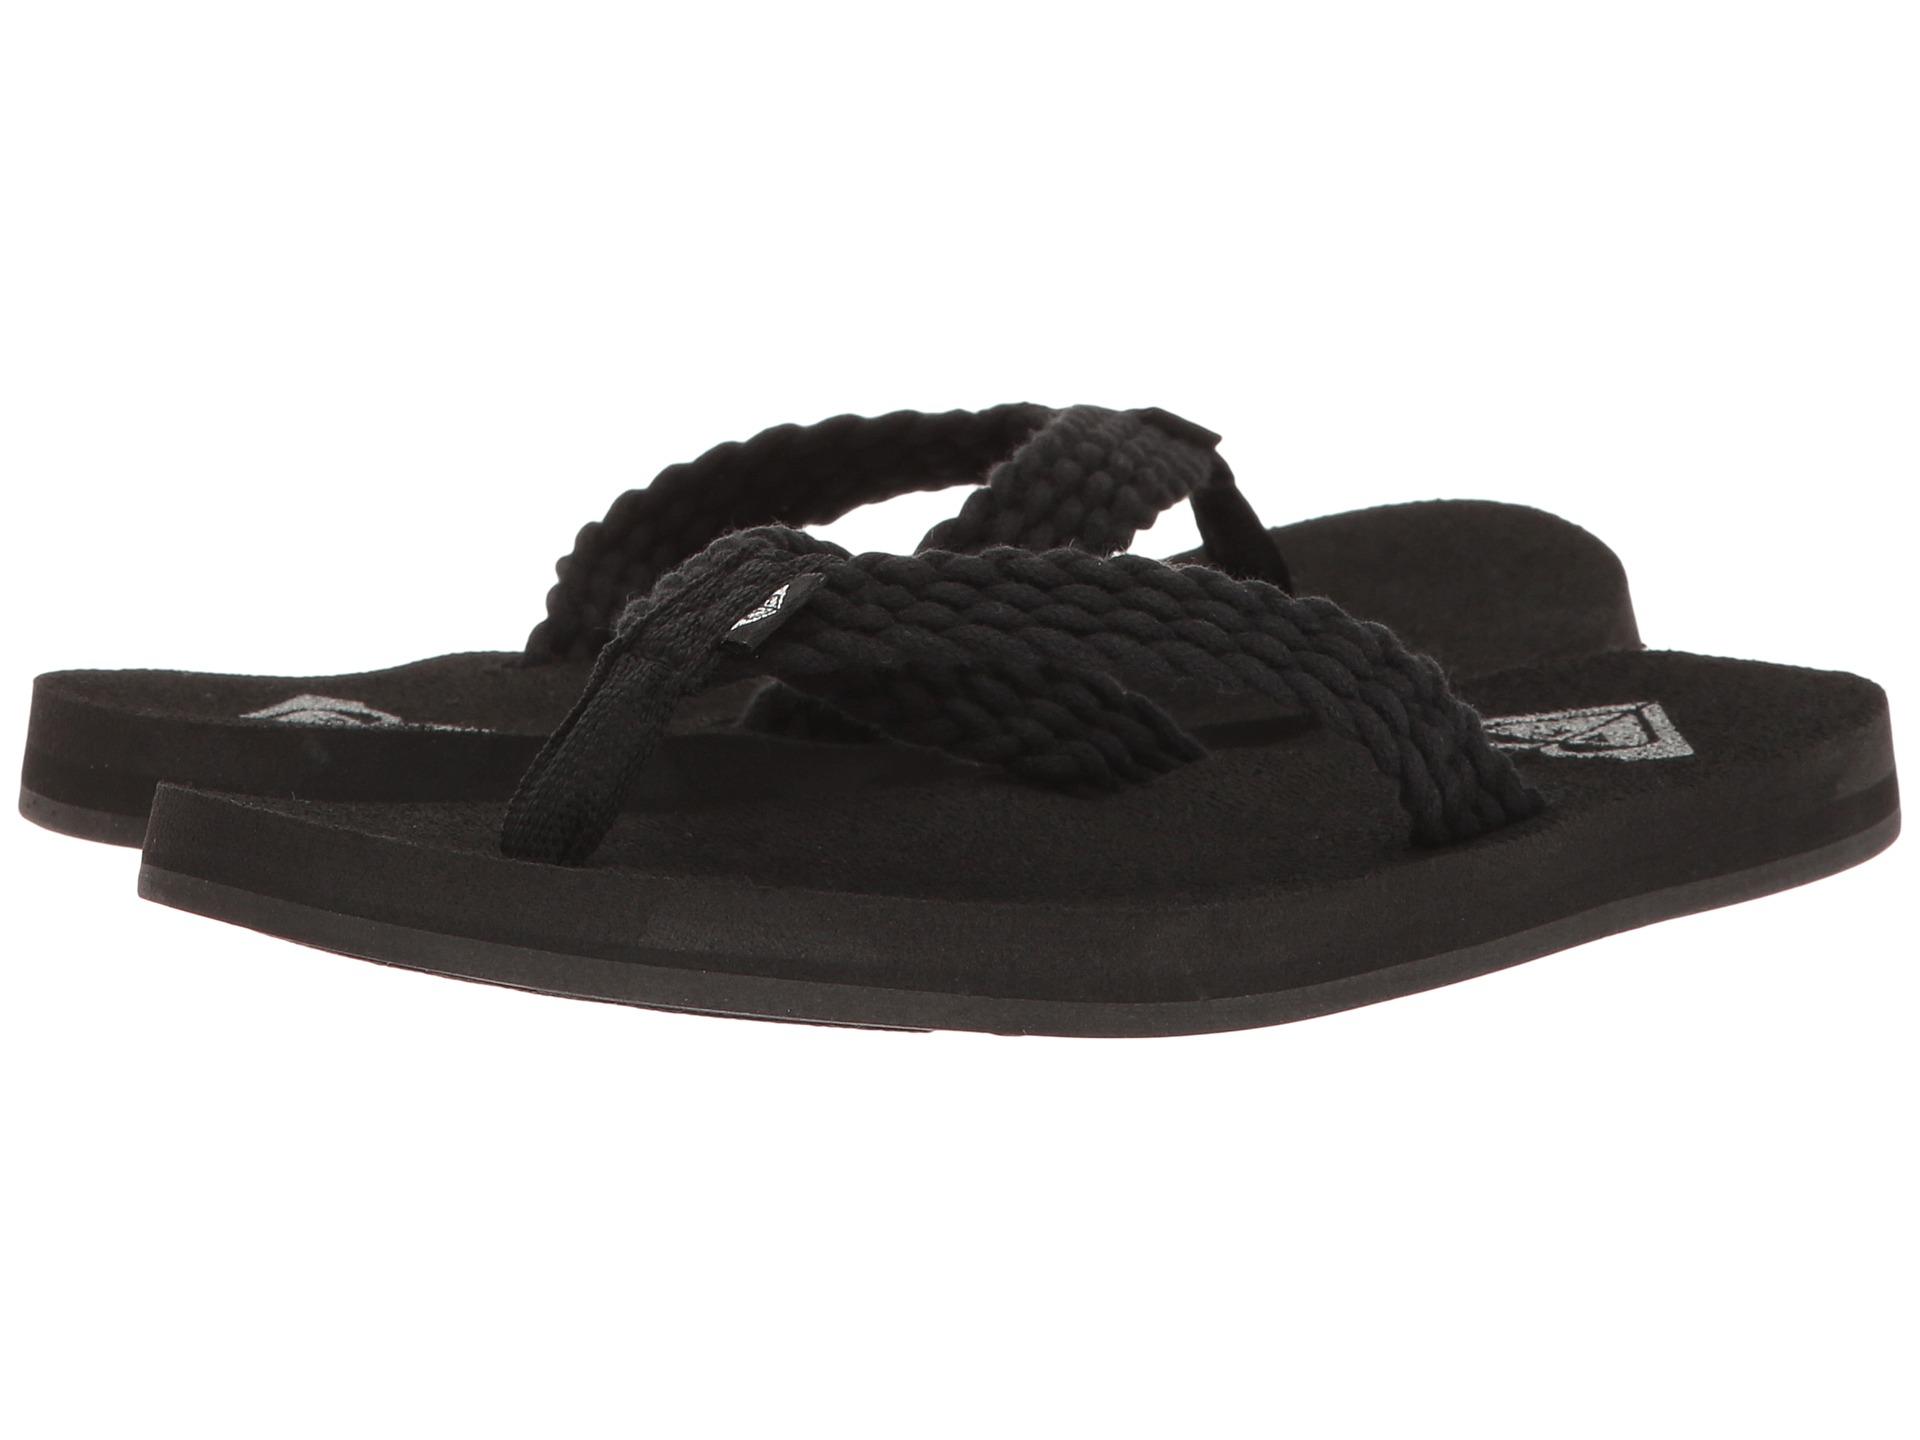 Black roxy sandals - Video